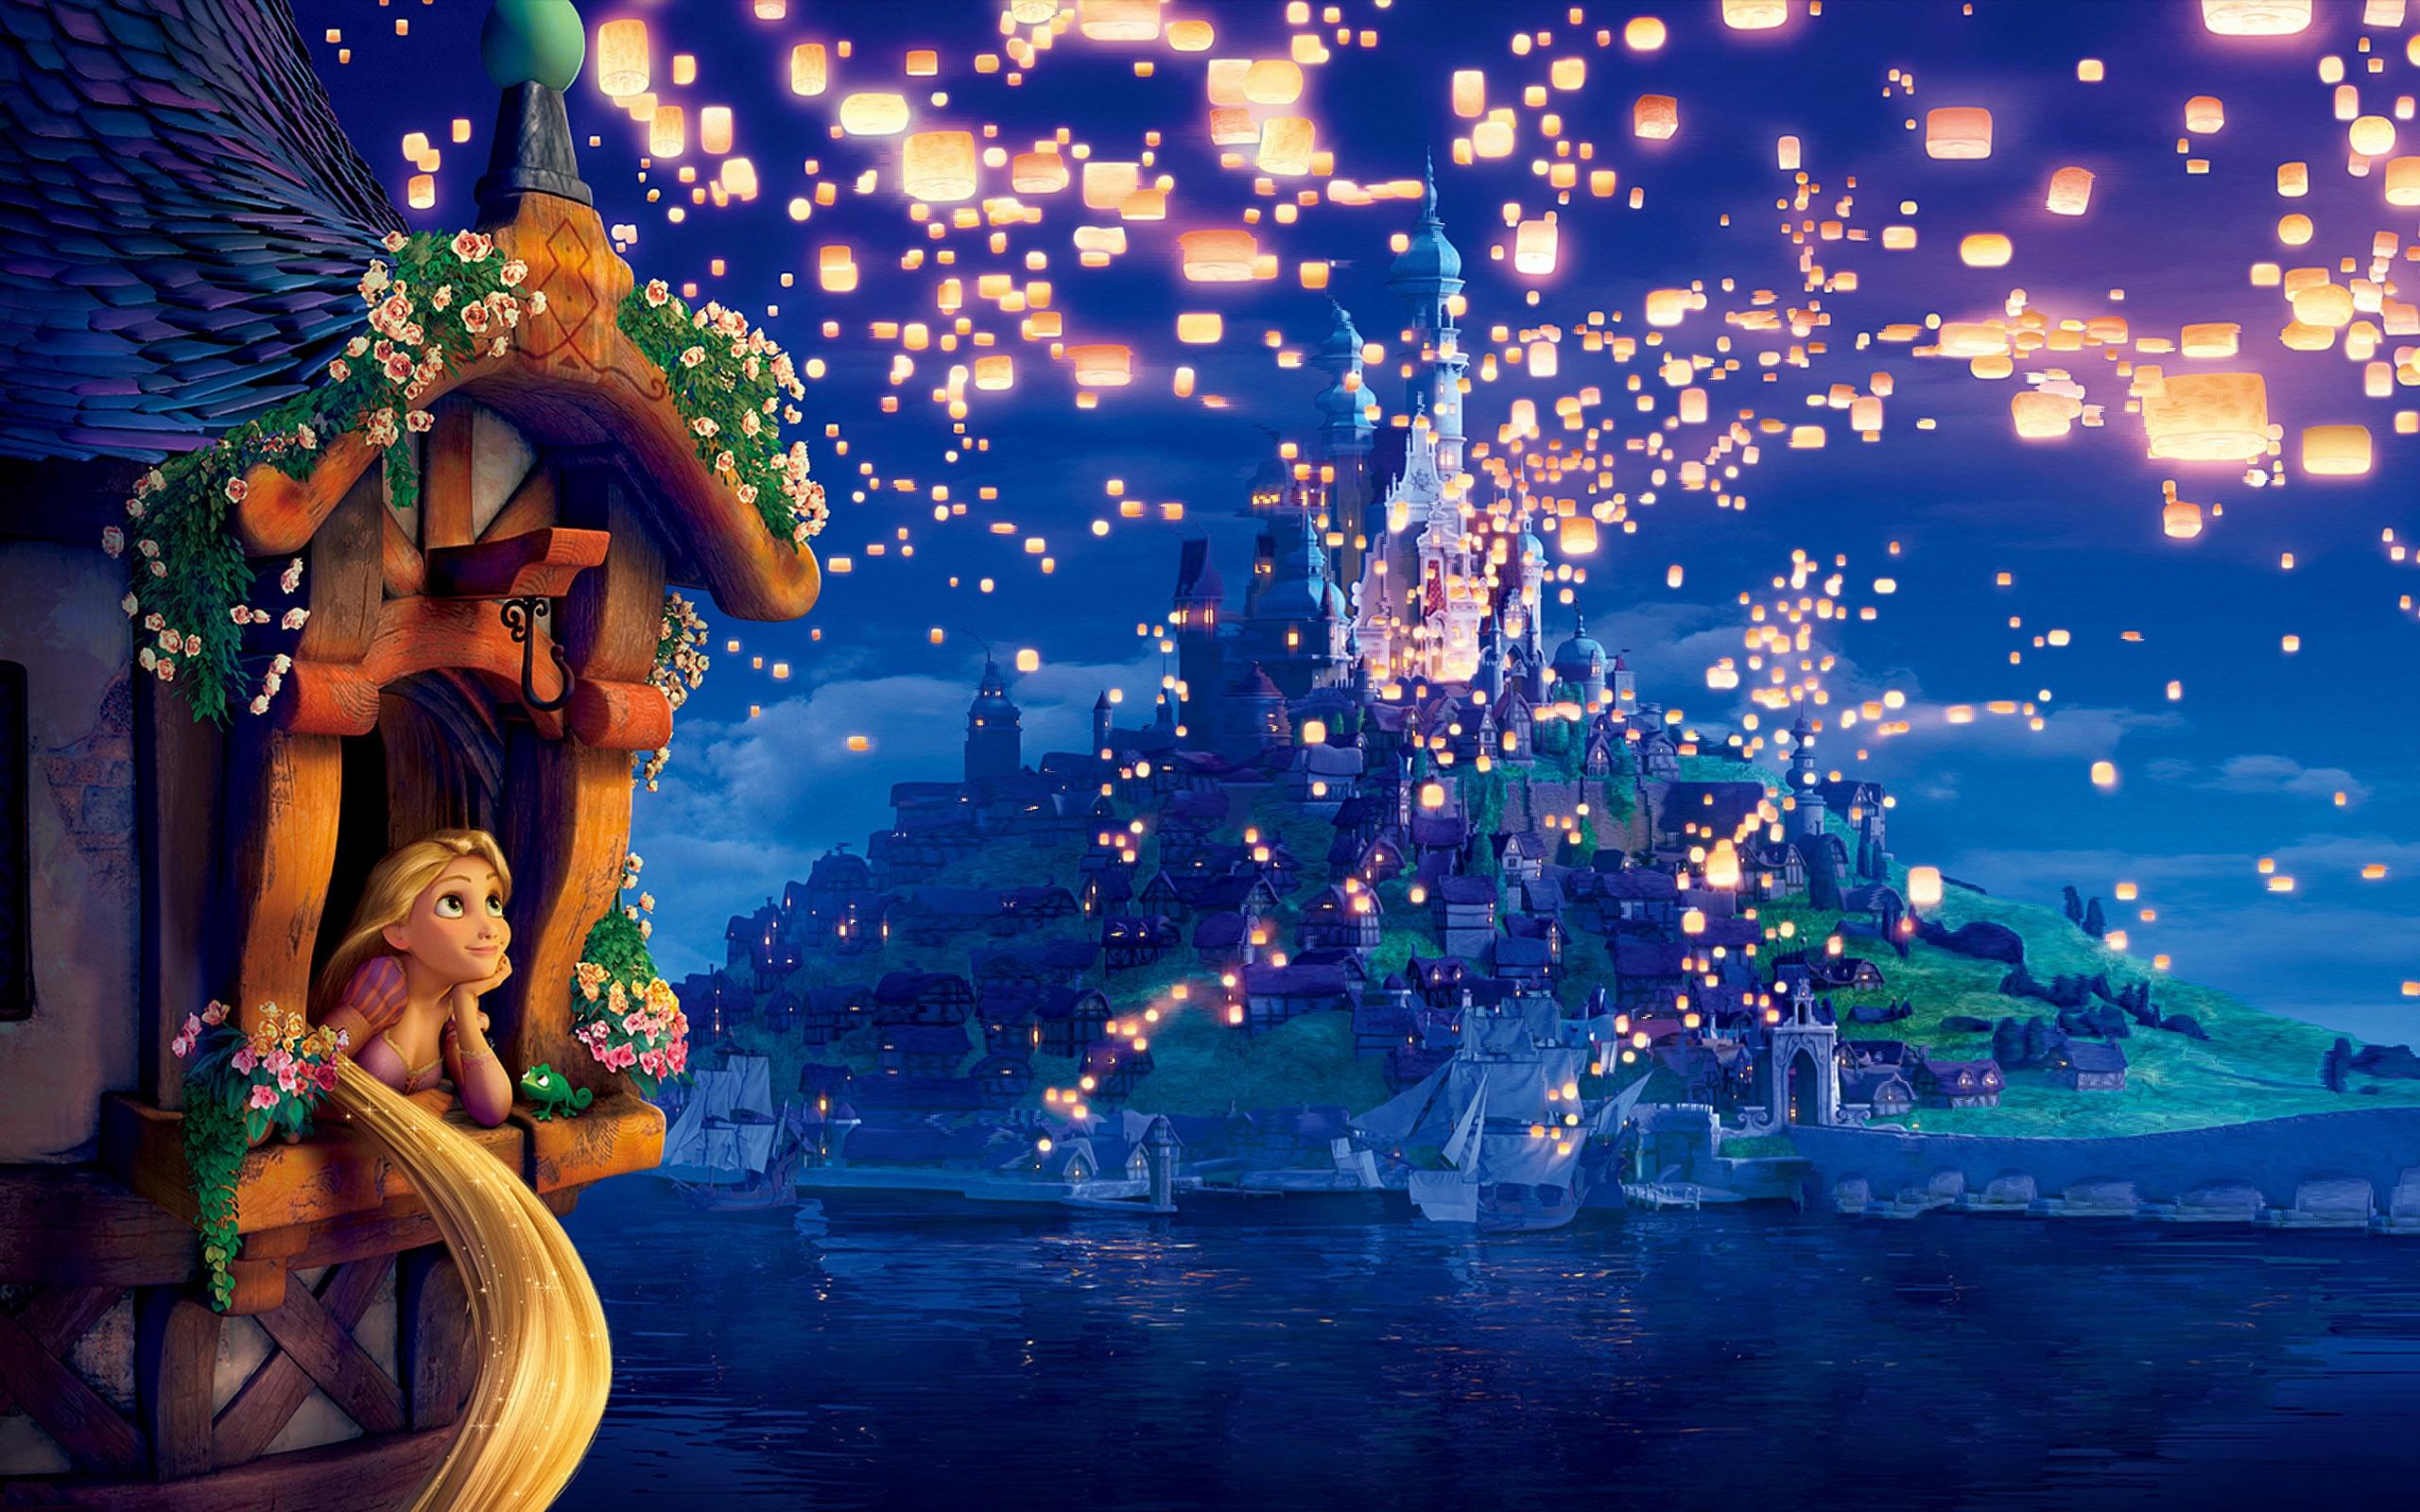 Beautiful Disney Backgrounds 19113